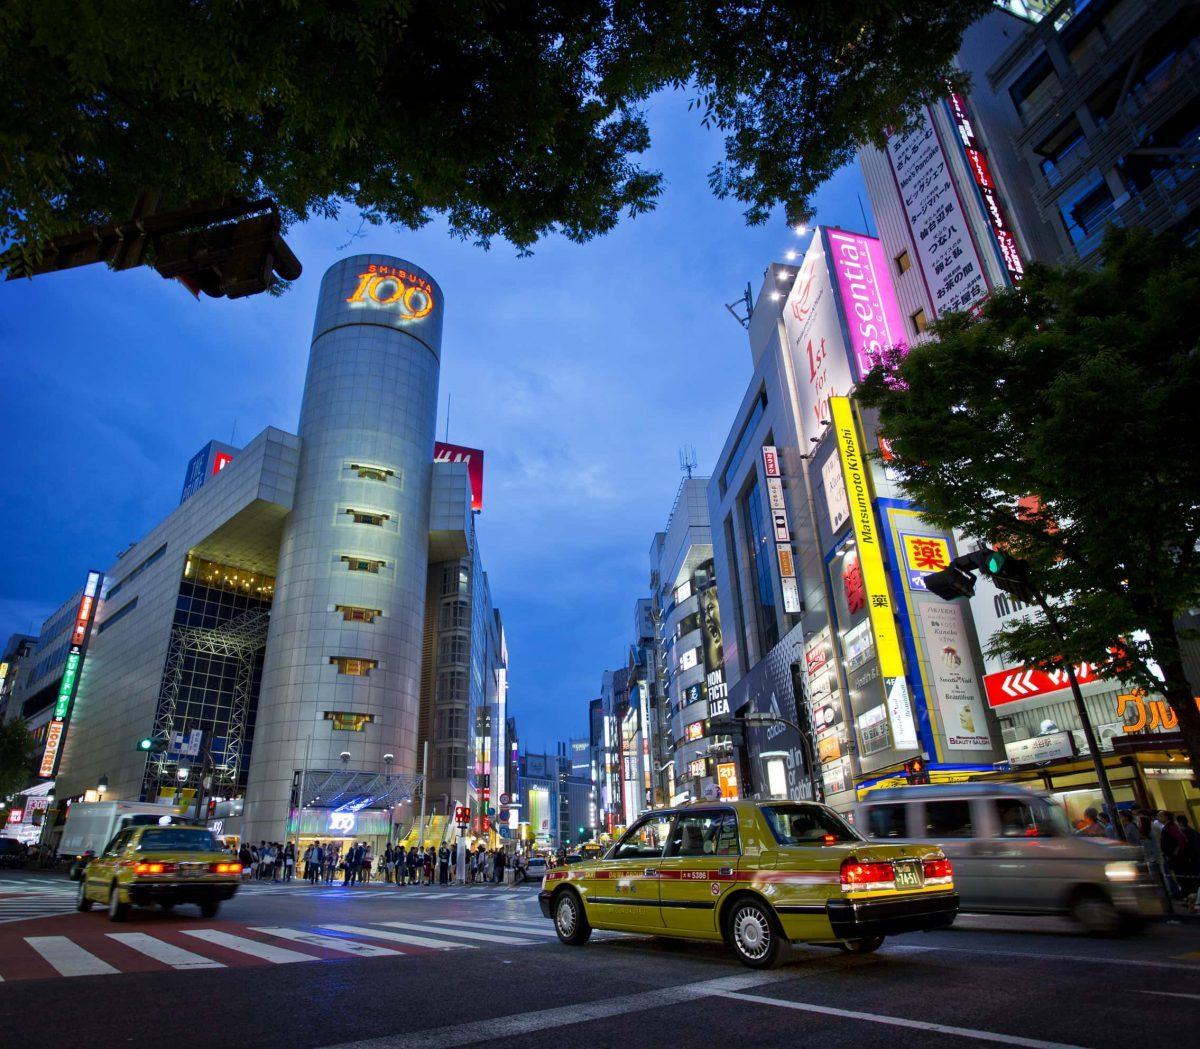 Tokyo, Shibuya Downtown, JAPAN, Shibuya 109, Tokyo taxi, Tokyo at night, Shibuya nightlife